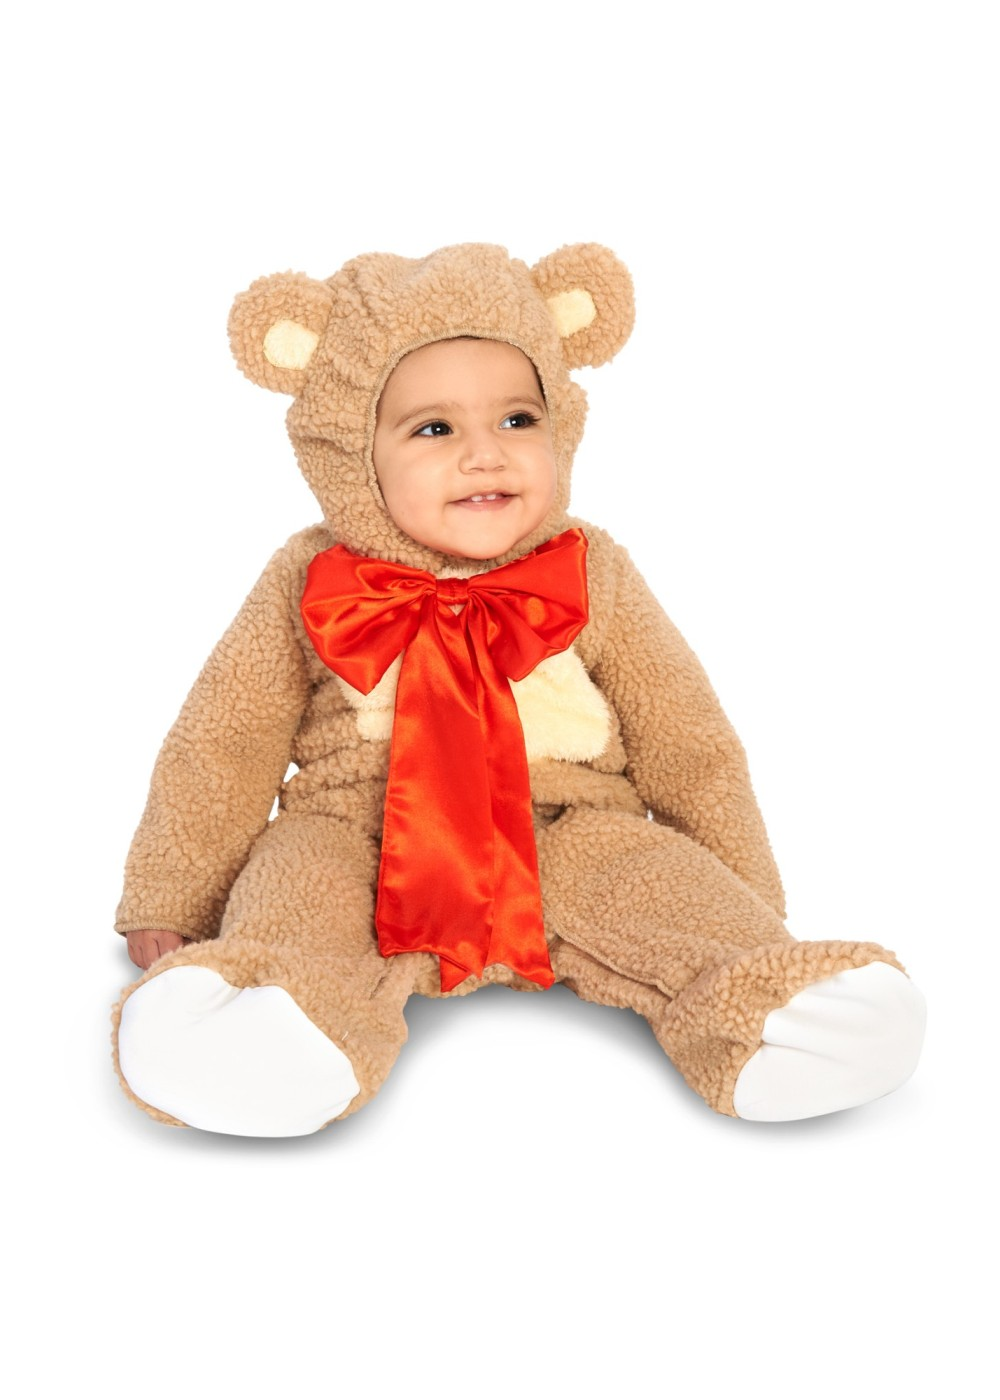 Cuddly Teddy Bear Infant Boys Costume Animal Costumes